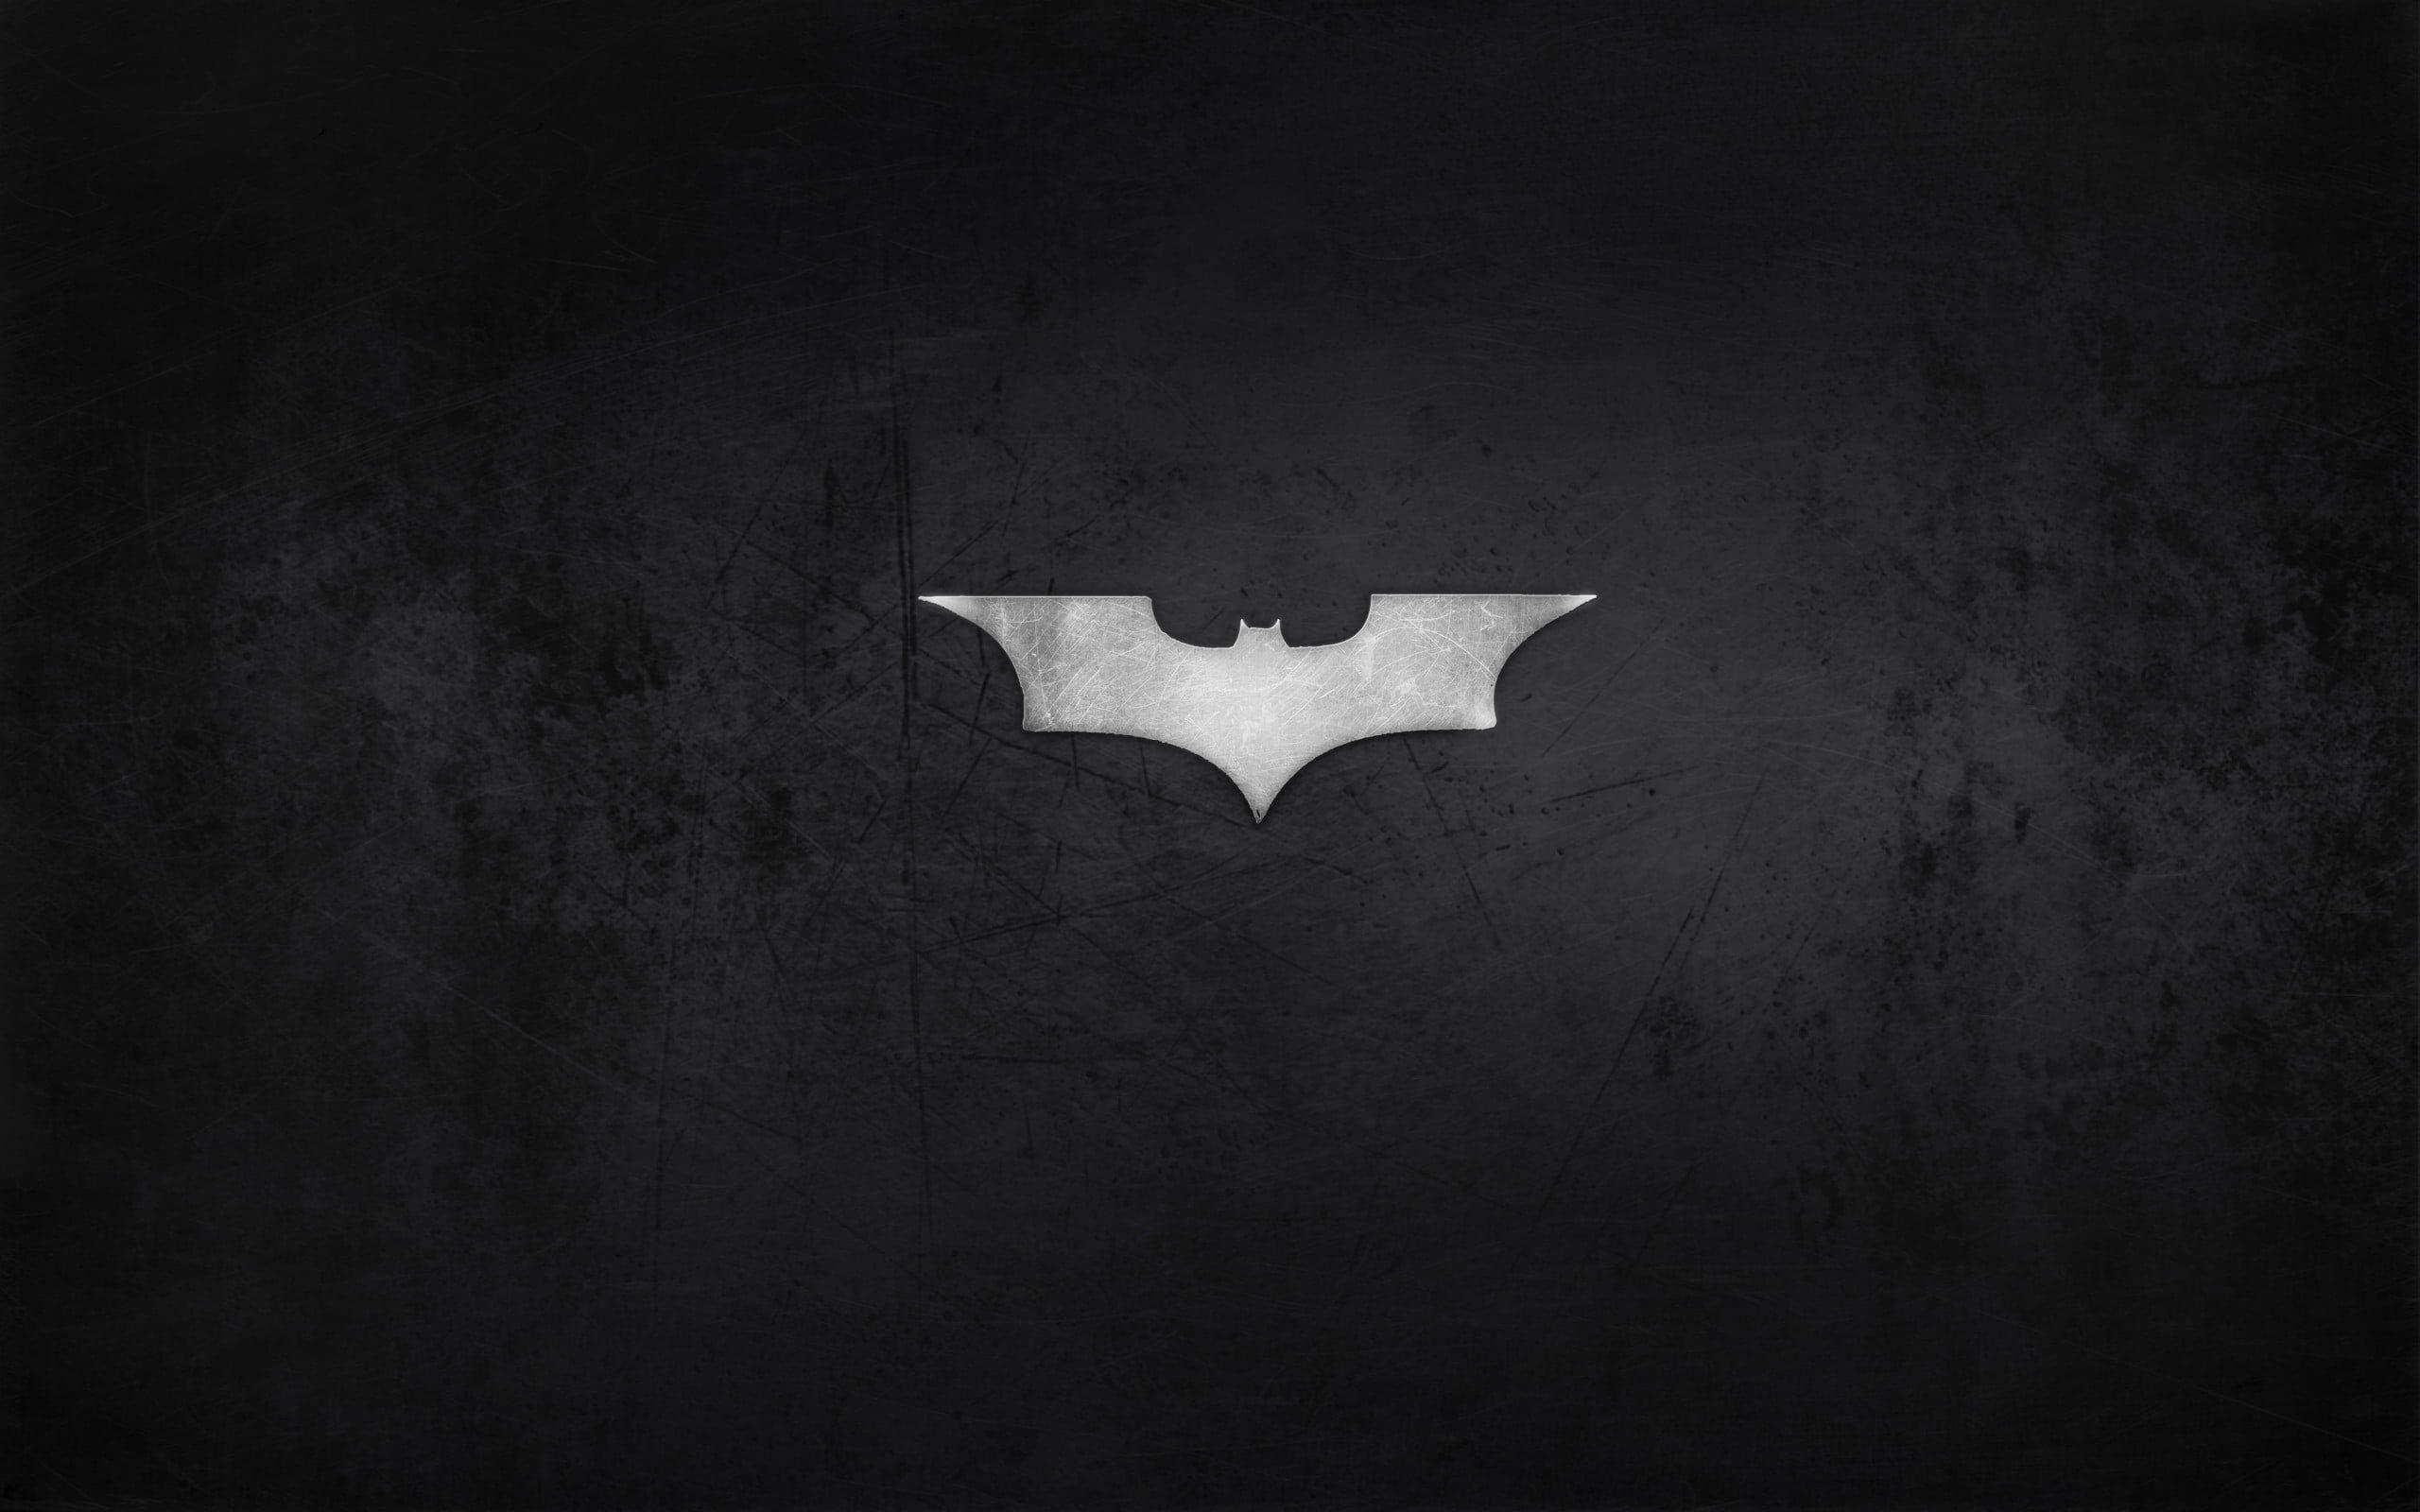 Batman Logo Batman Logo Batman 2k Wallpaper Hdwallpaper Desktop In 2021 Batman Backgrounds Batman Wallpaper Superman Wallpaper